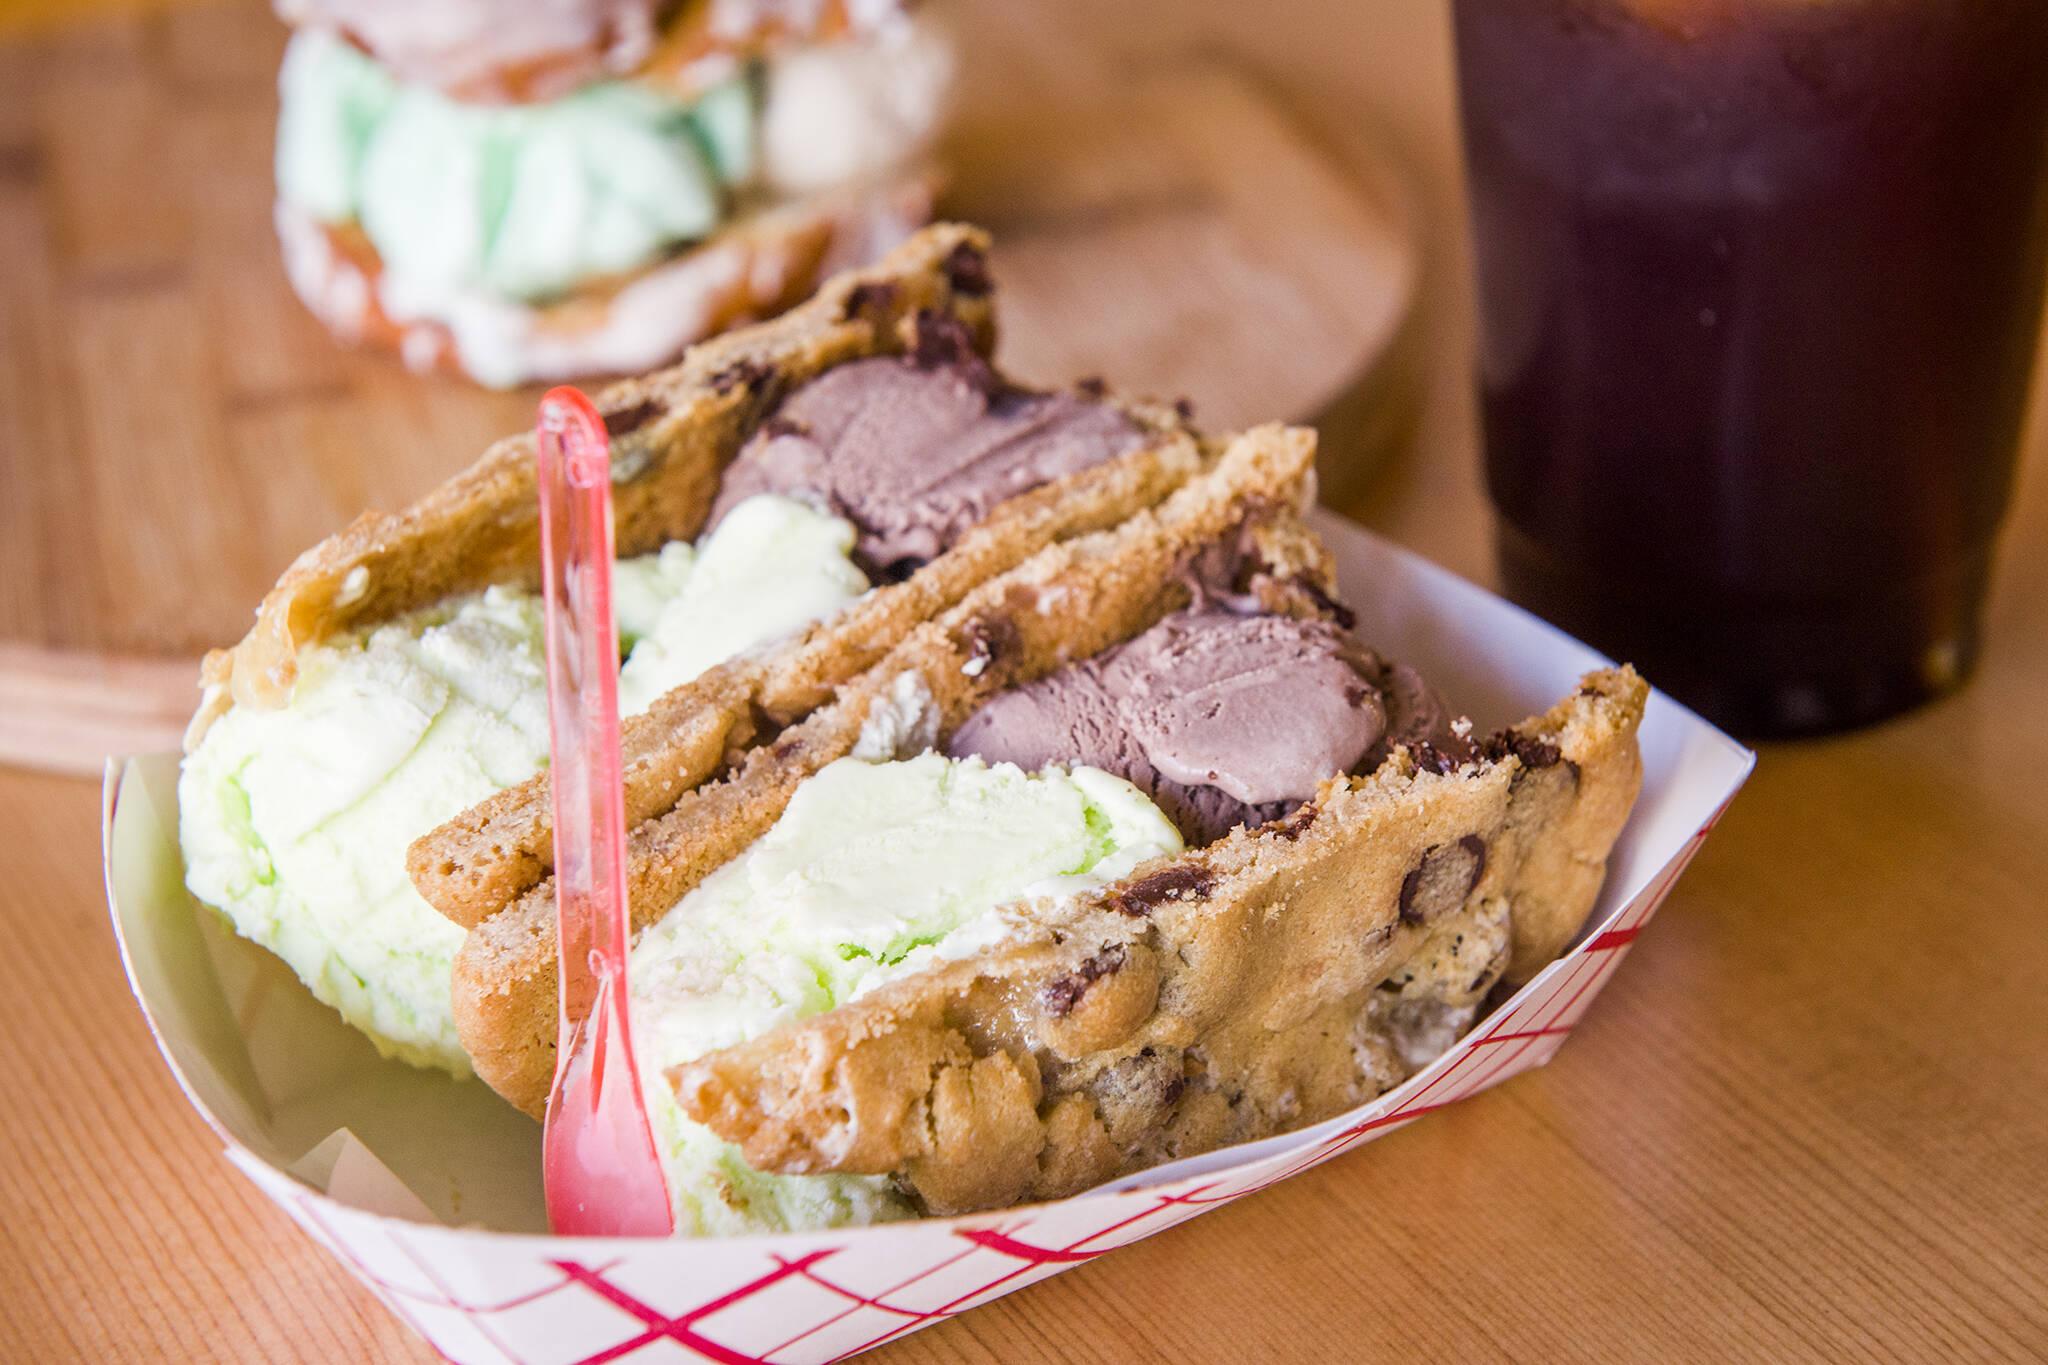 ice cream sandwich toronto